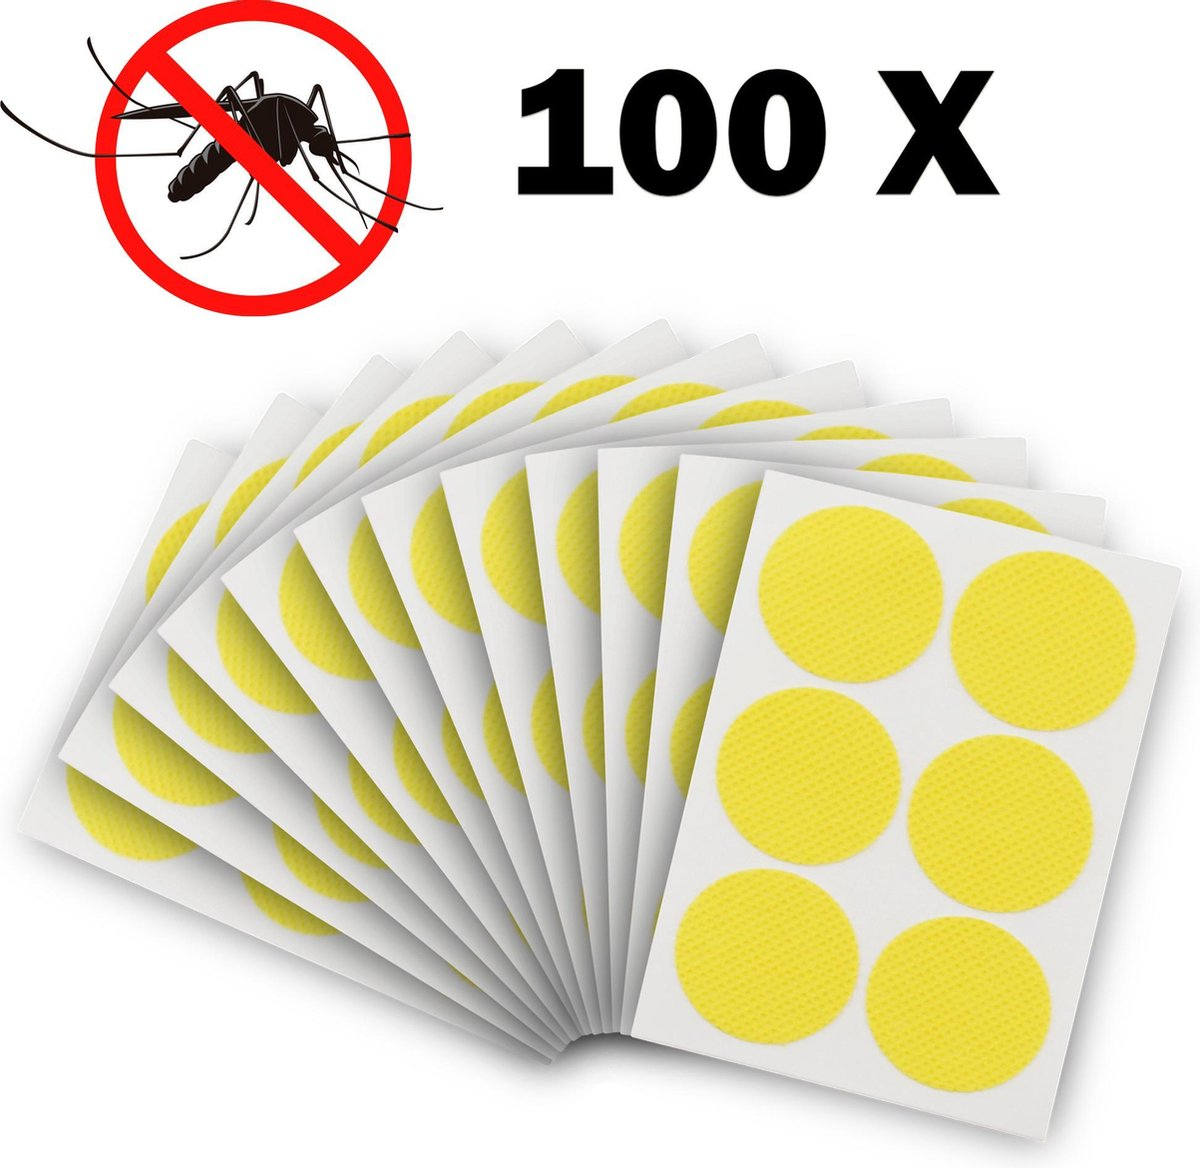 100 anti muggen stickers - citronella pleister deet vrij baby kind veilig - anti mug  pleisters anti